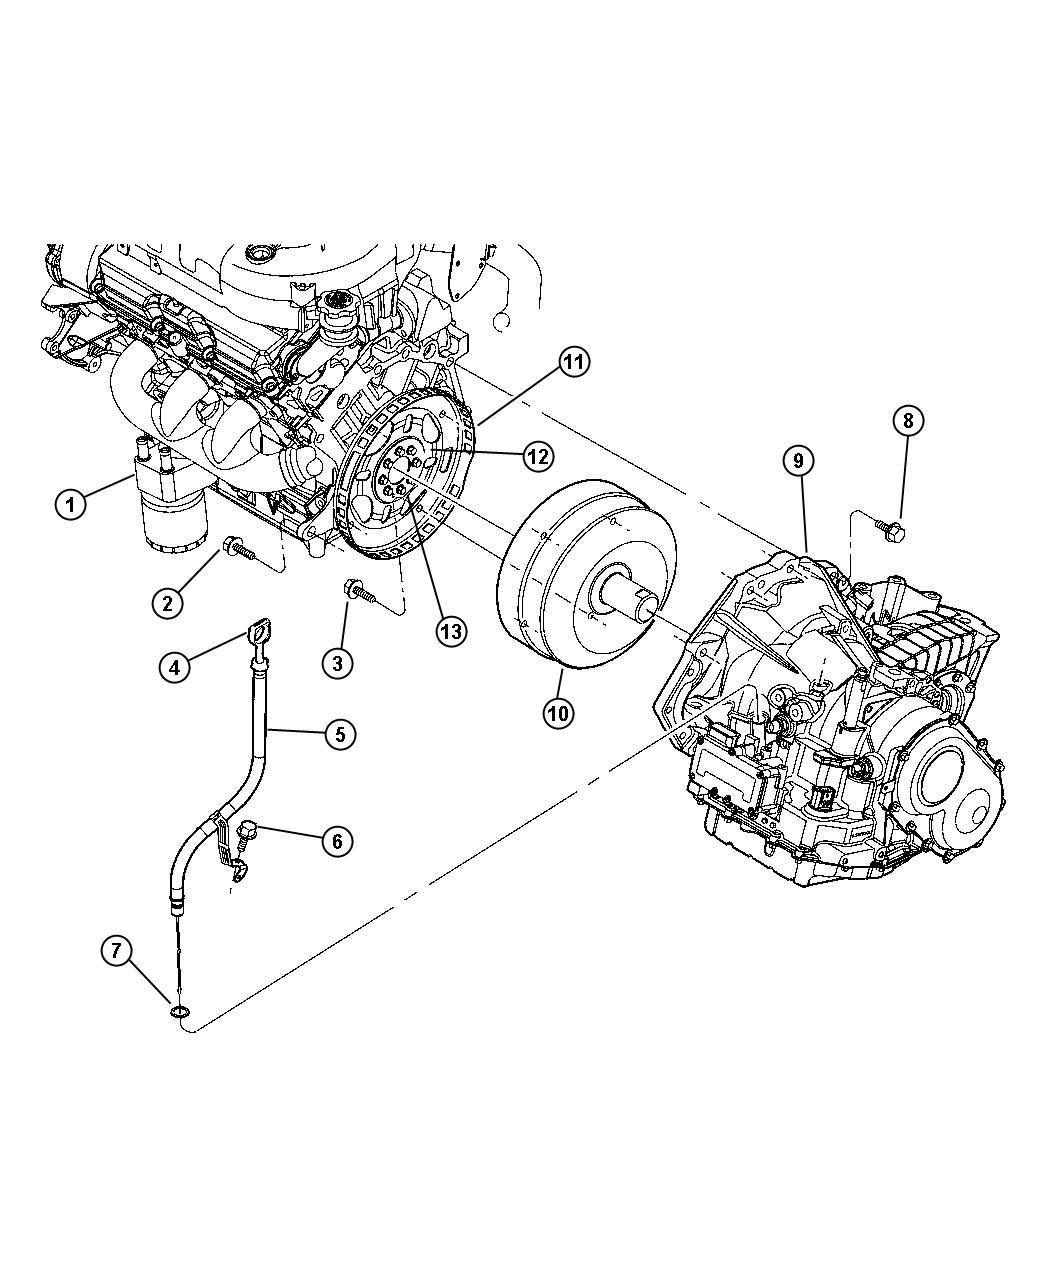 Chrysler Pacifica Indicator. Transmission fluid level